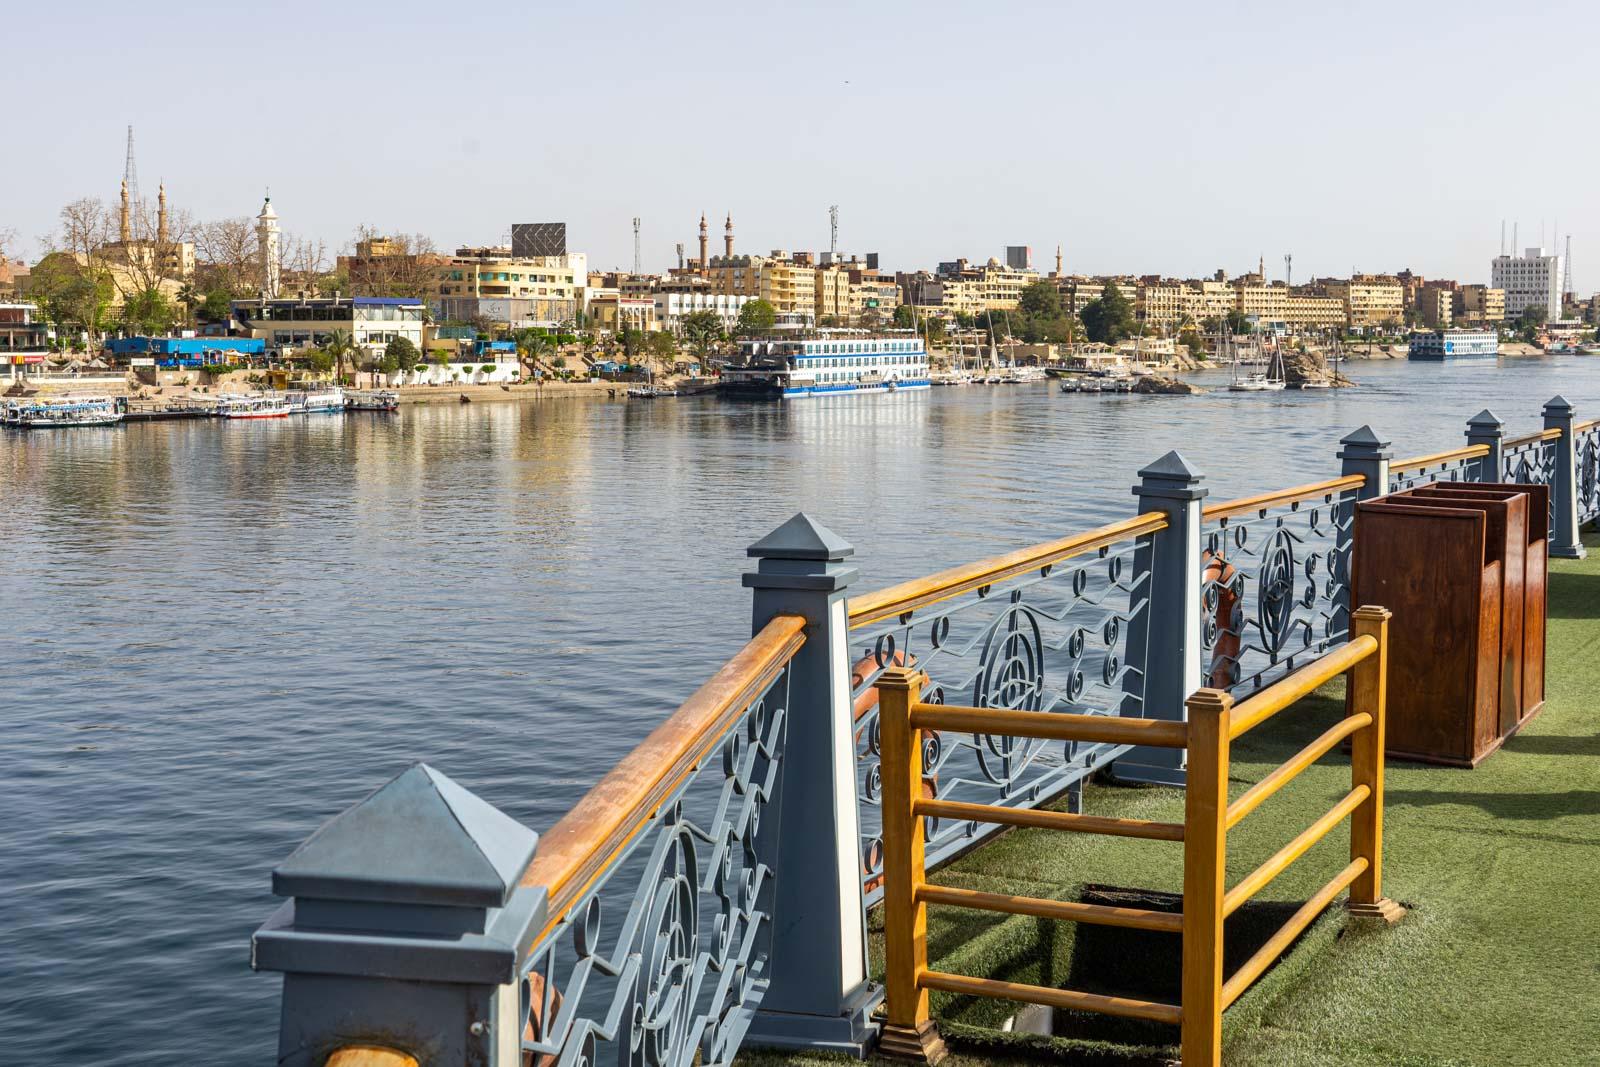 Nile cruise, Aswan, Egypt